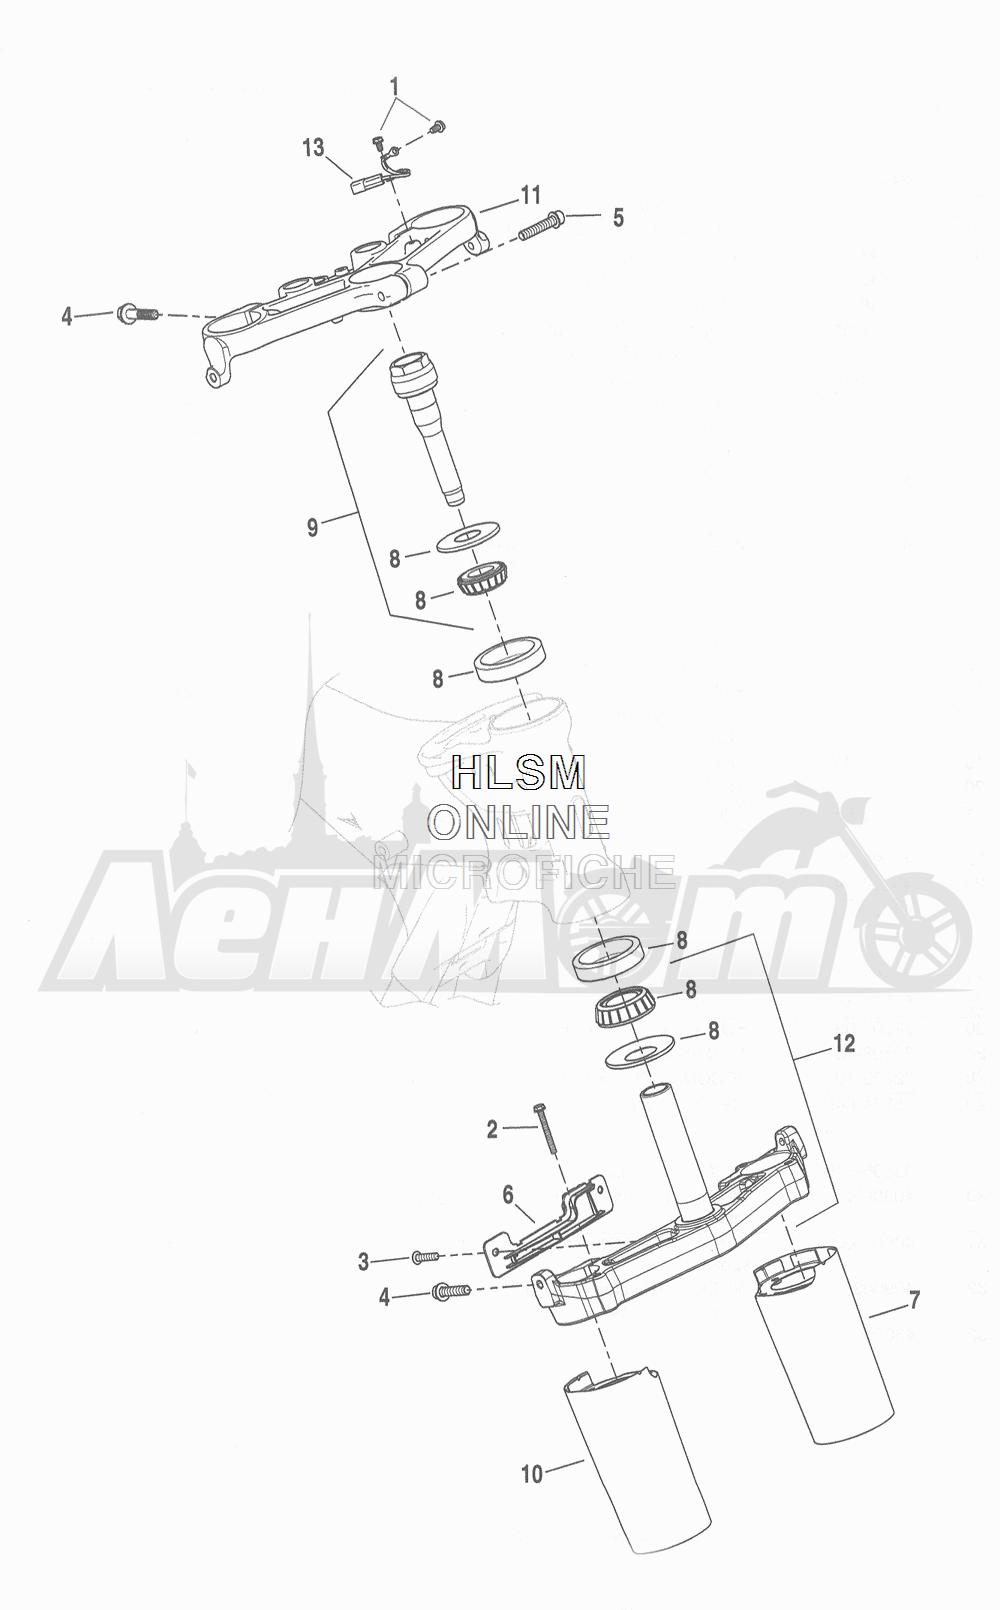 Запчасти для Мотоцикла Harley-Davidson 2016 FLHRC ROAD KING CLASSIC (FRM) Раздел: SUSPENSION - FRONT FORK BRACKETS | передняя подвеска вилка кронштейны